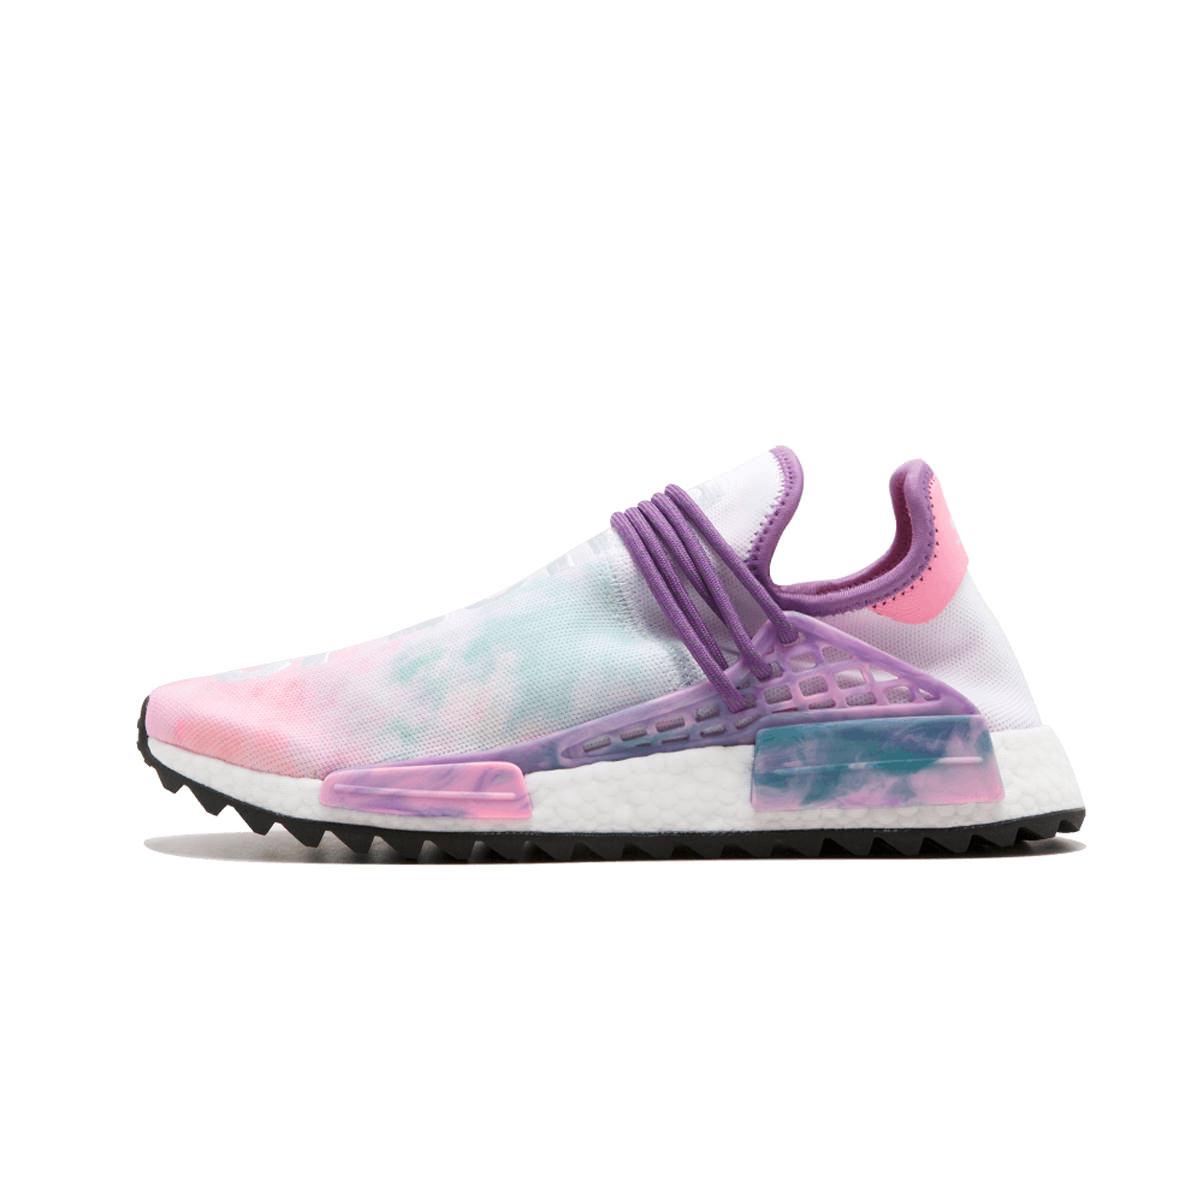 2007bdddf5c18 adidas Human Race NMD Pharrell Holi Festival (Pink Glow) - OFour